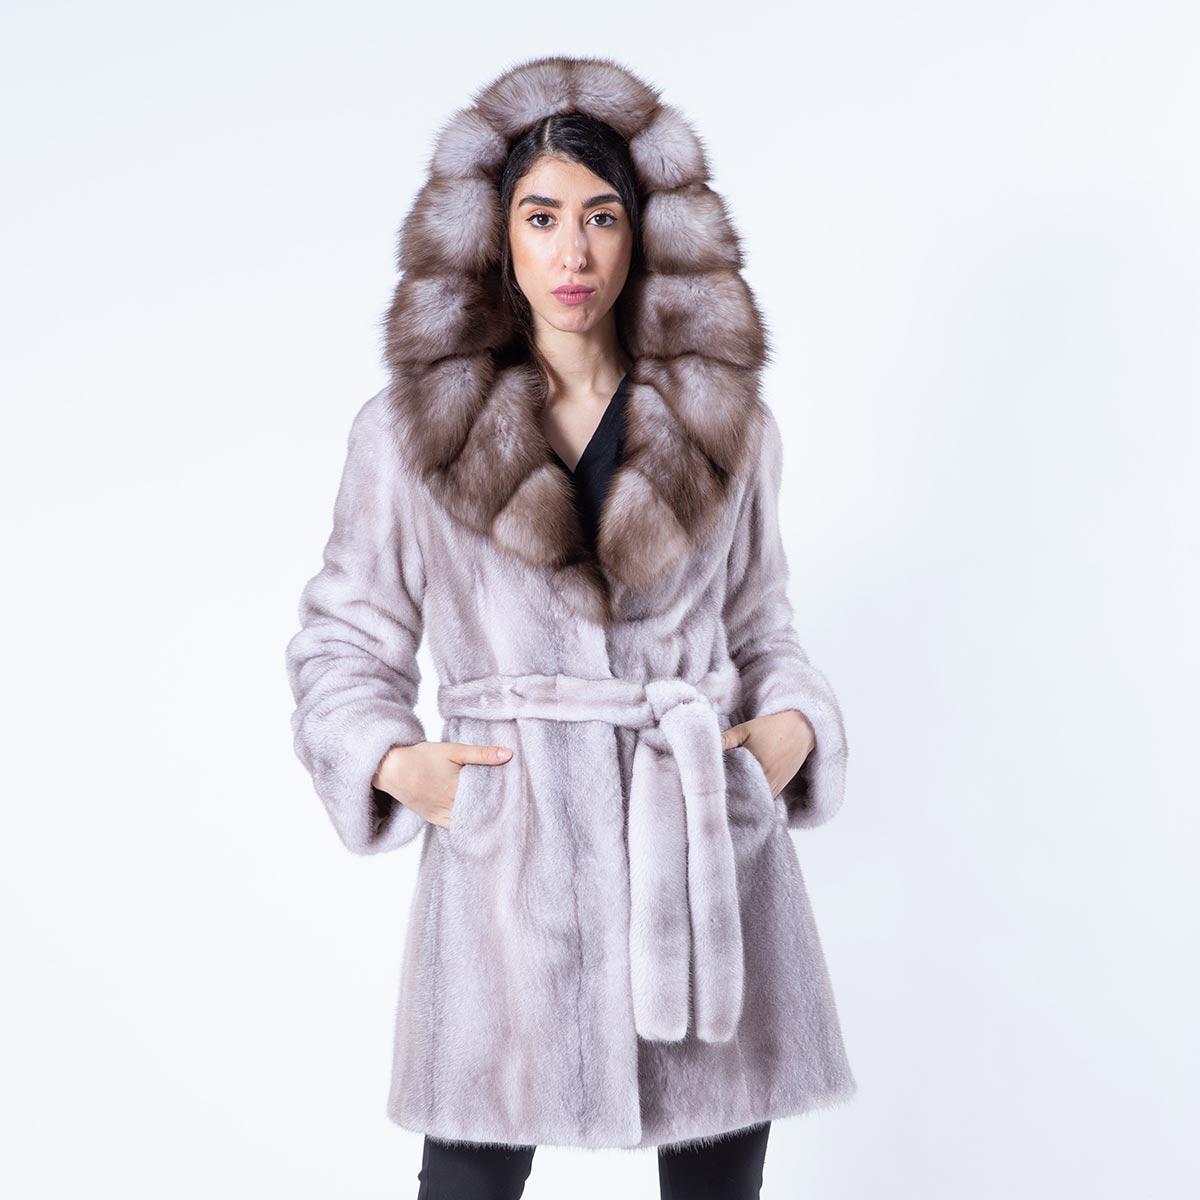 Aurora Ice Fume Mink Jacket with Marten Hood | Пальто Аврора из норки цвета Ice Fume с капюшоном - Sarigianni Furs